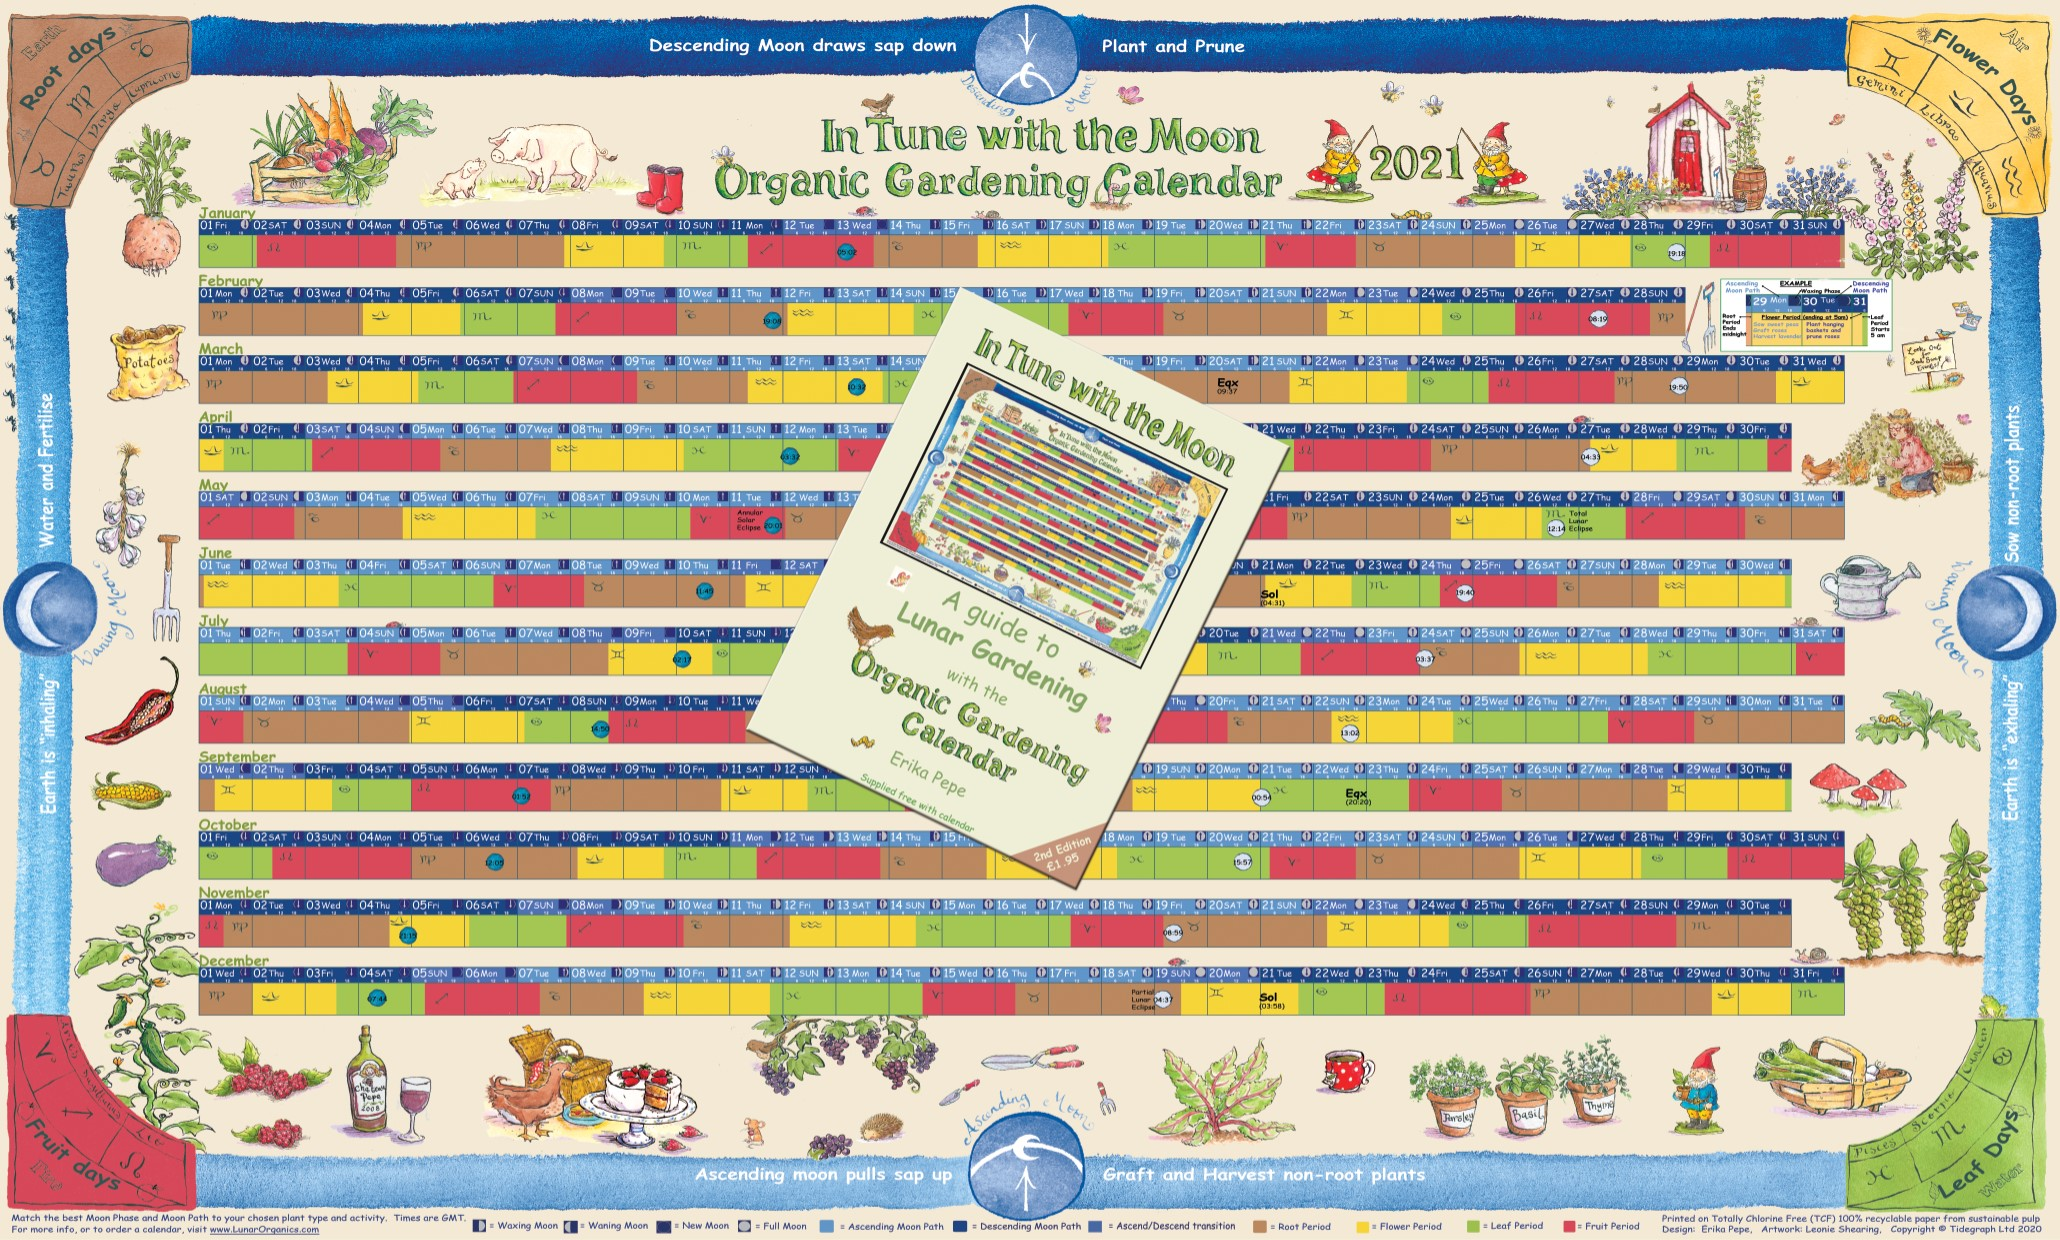 Images of Gardening Calendar 2021